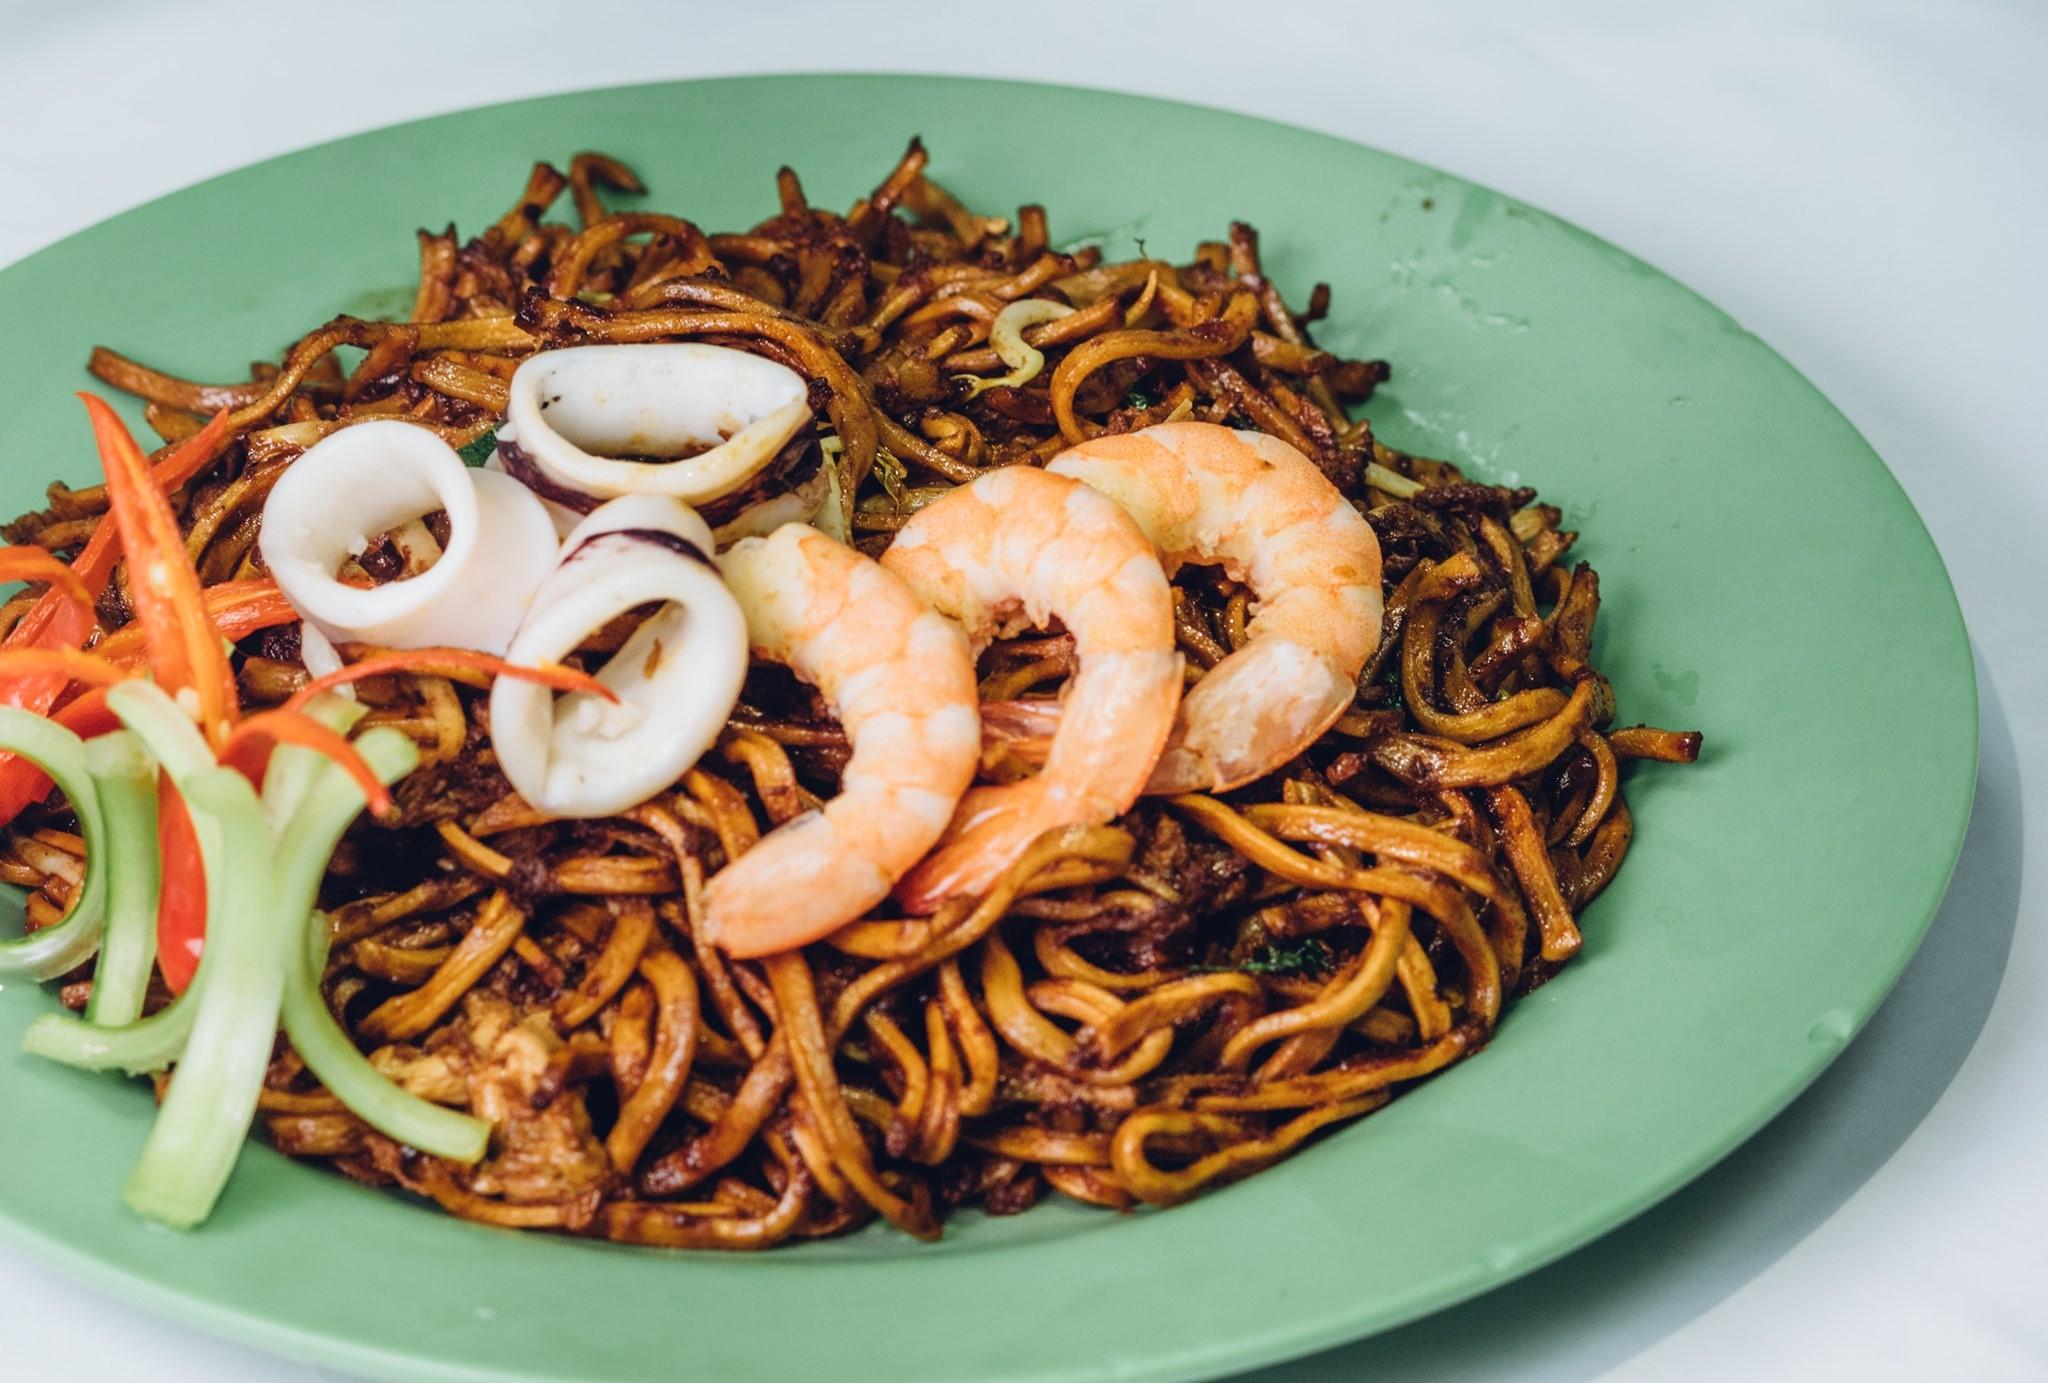 Cahaya Halal Restaurant near Orchard Road, halal food at far east plaza